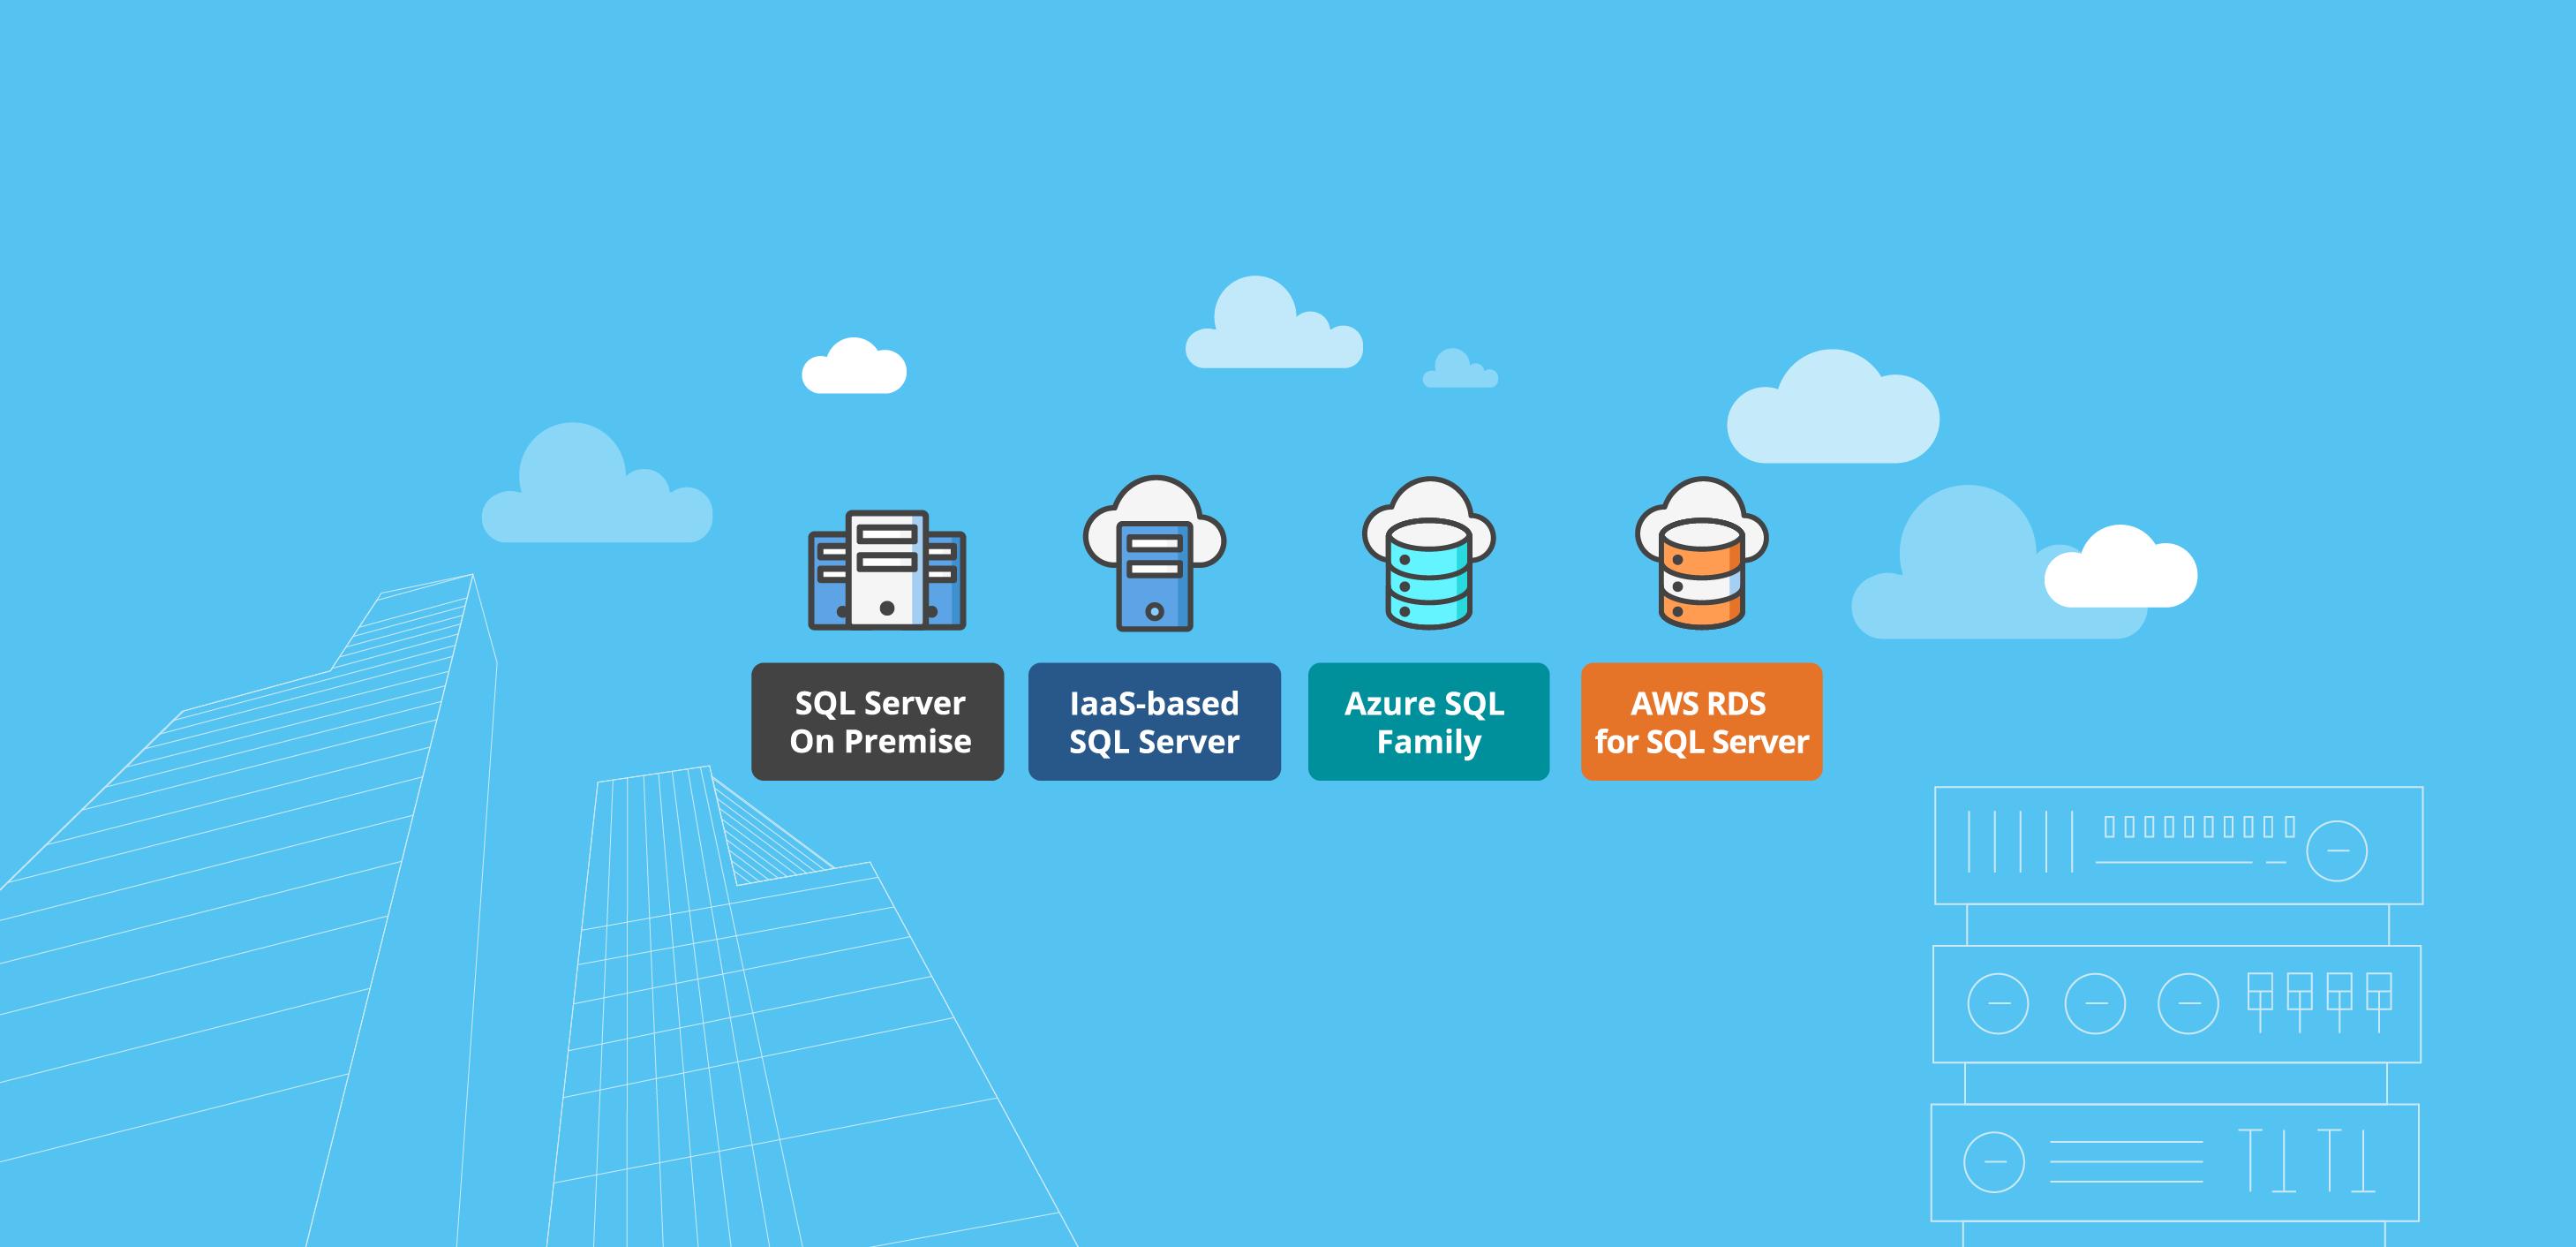 Introducing World's First SaaS Platform to Deliver Deep Diagnostics for Hybrid SQL Server Environments